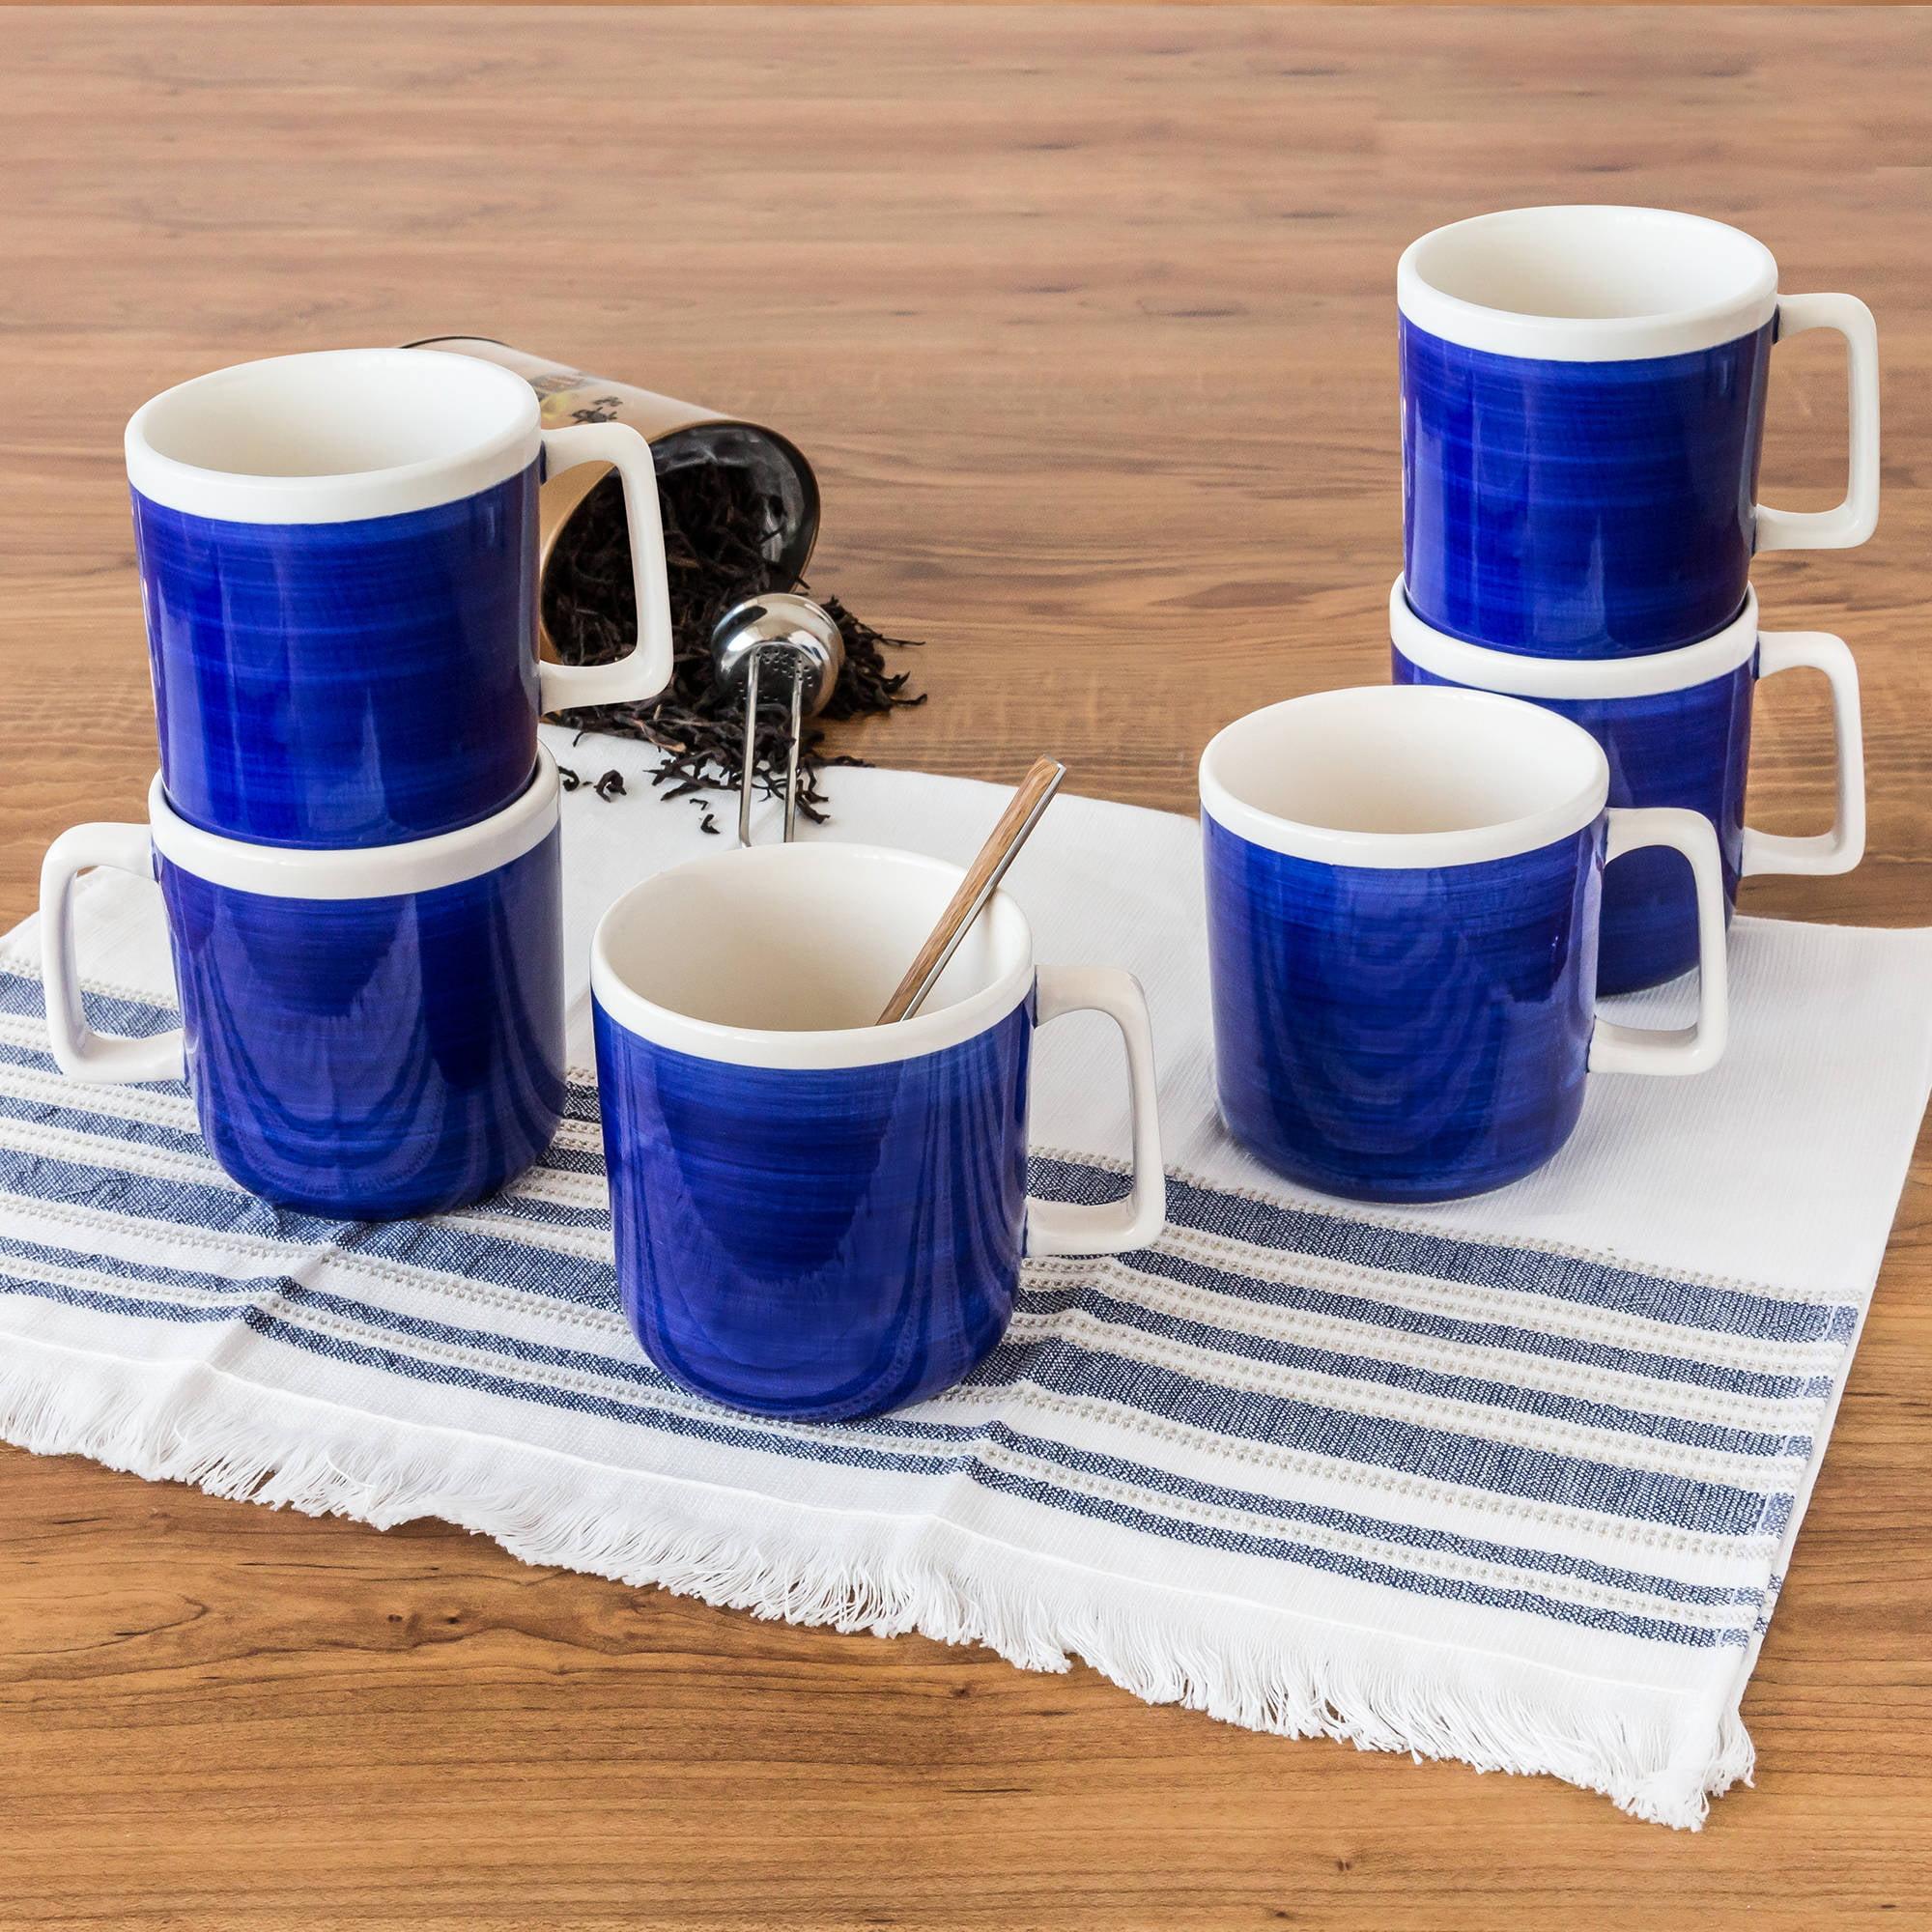 Better Homes and Gardens Indigo Swirl Mugs, Blue, Set of 6